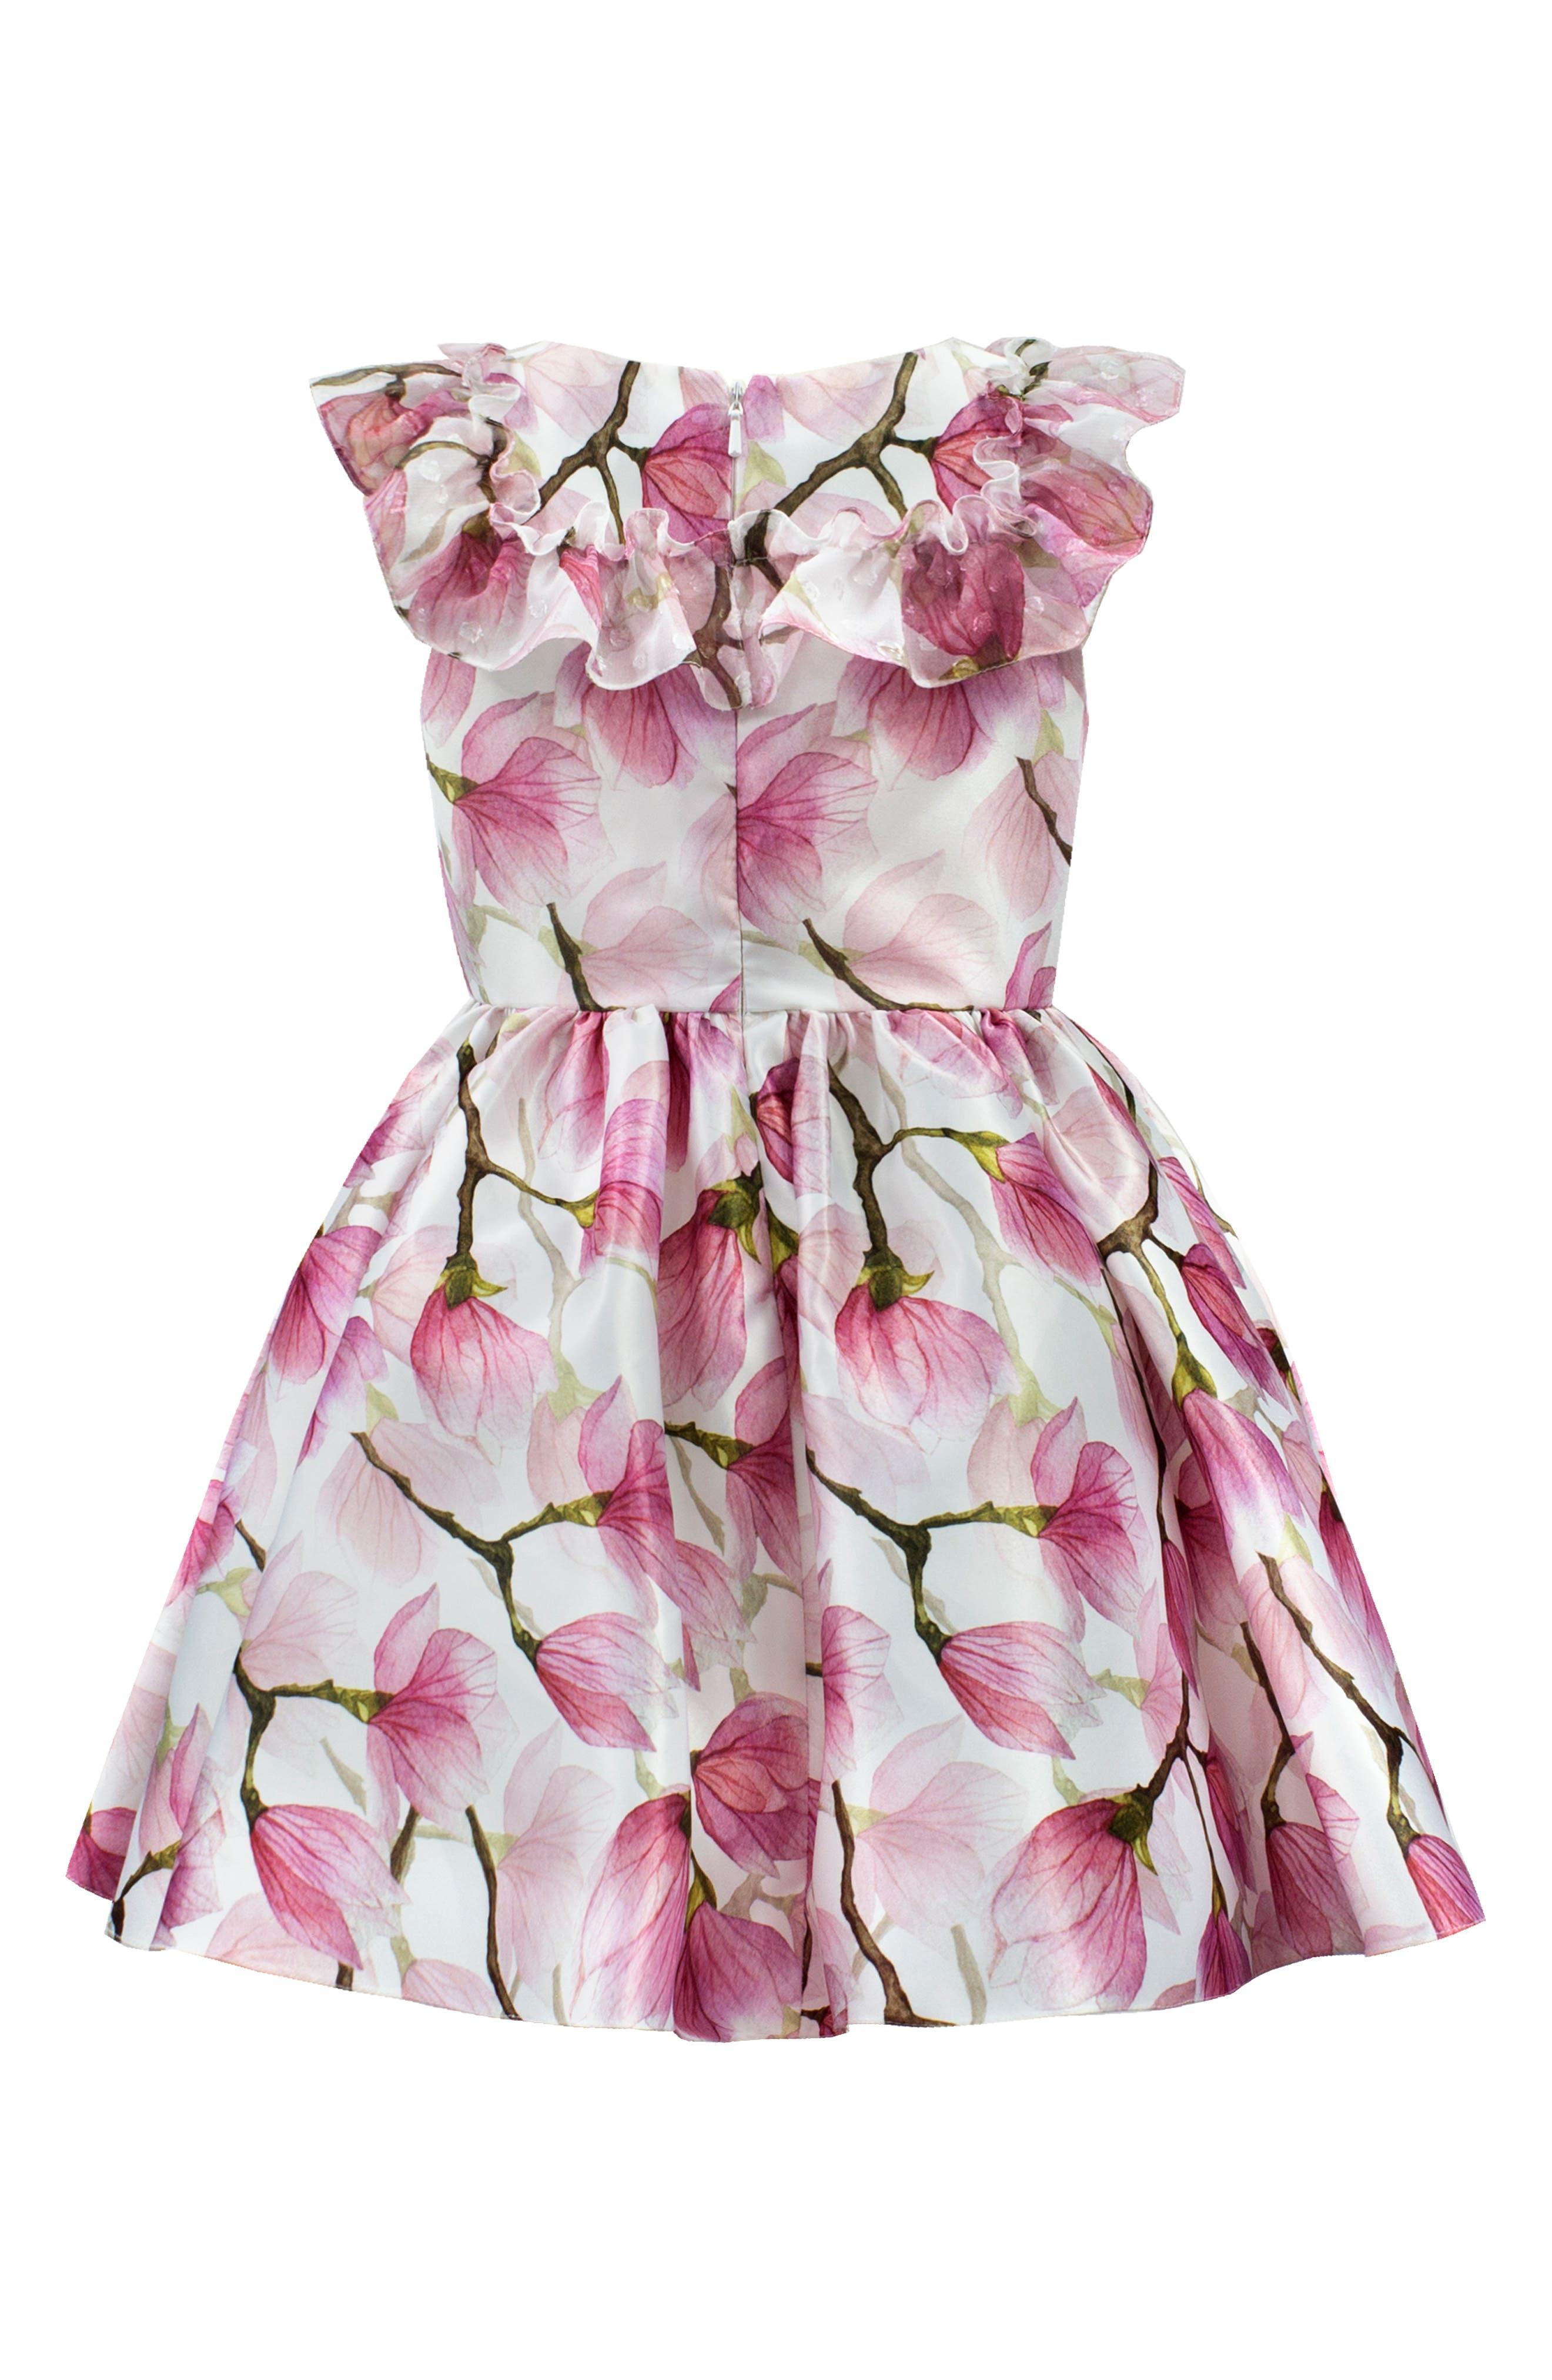 DAVID CHARLES, Floral Ruffle Party Dress, Alternate thumbnail 2, color, PINK